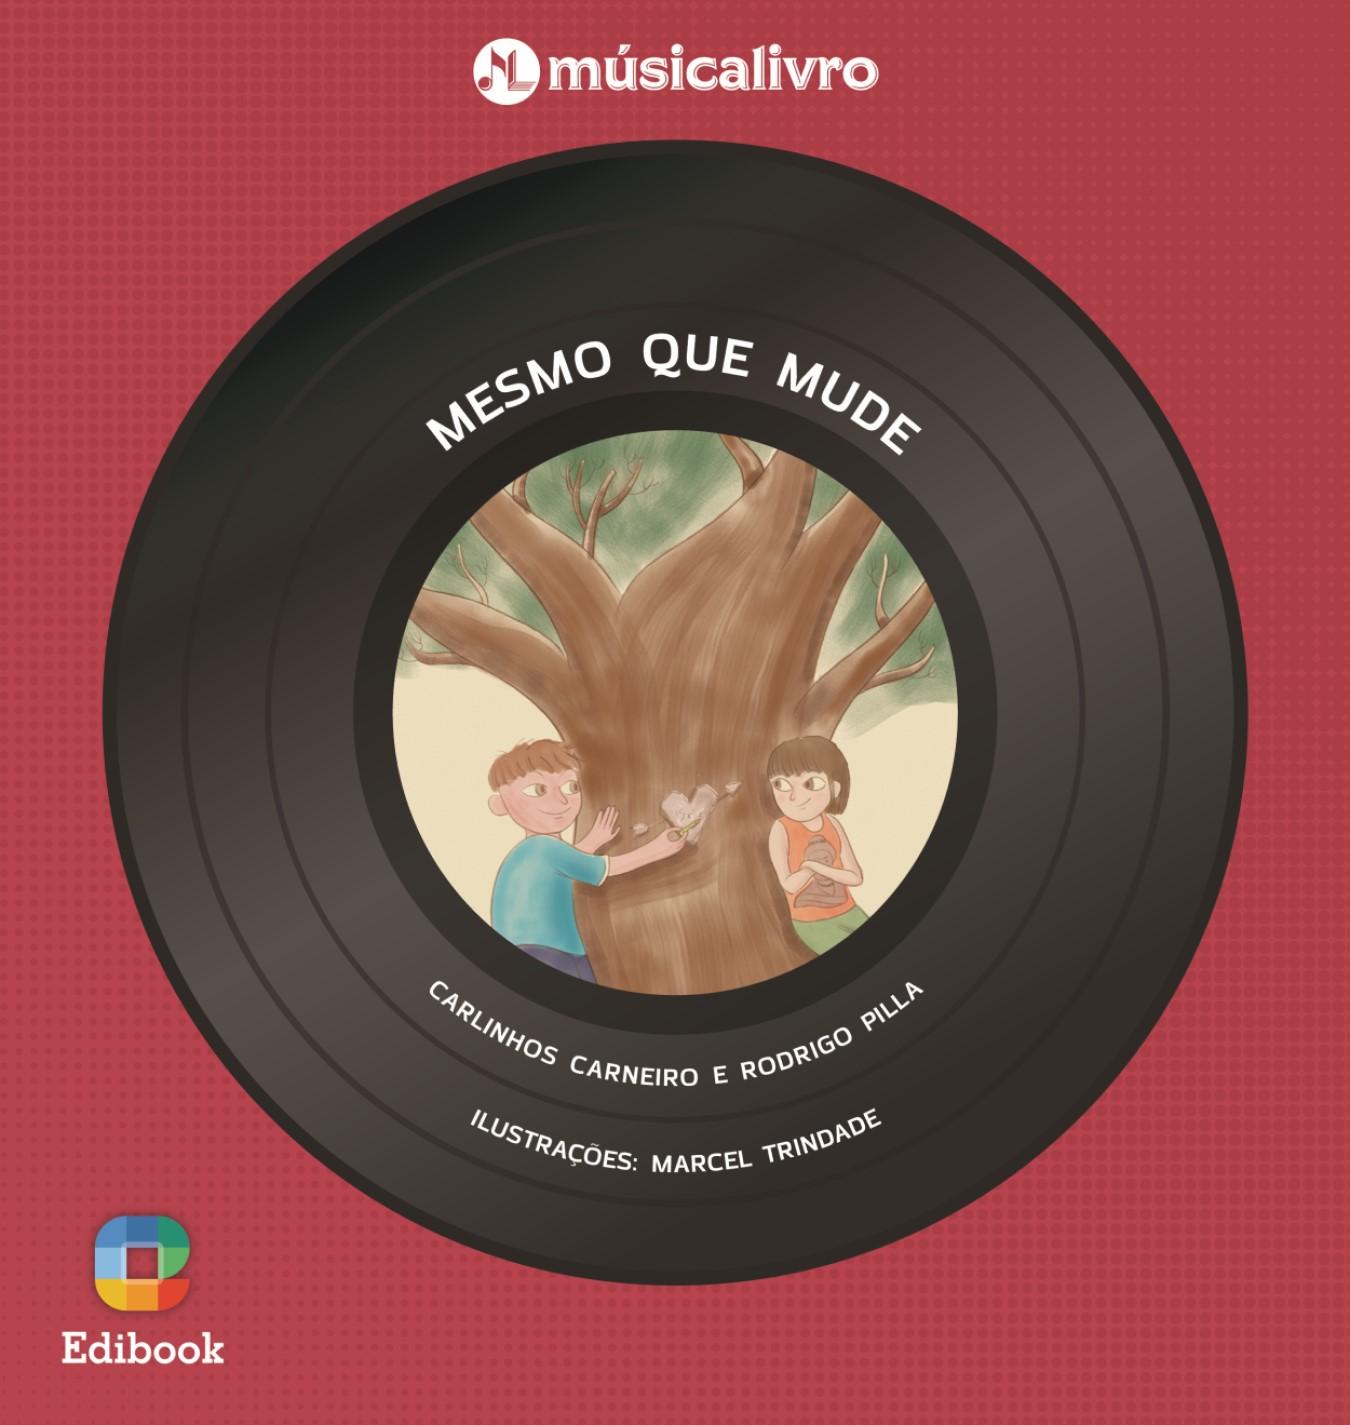 MUSICALIVRO - MESMO QUE MUDE